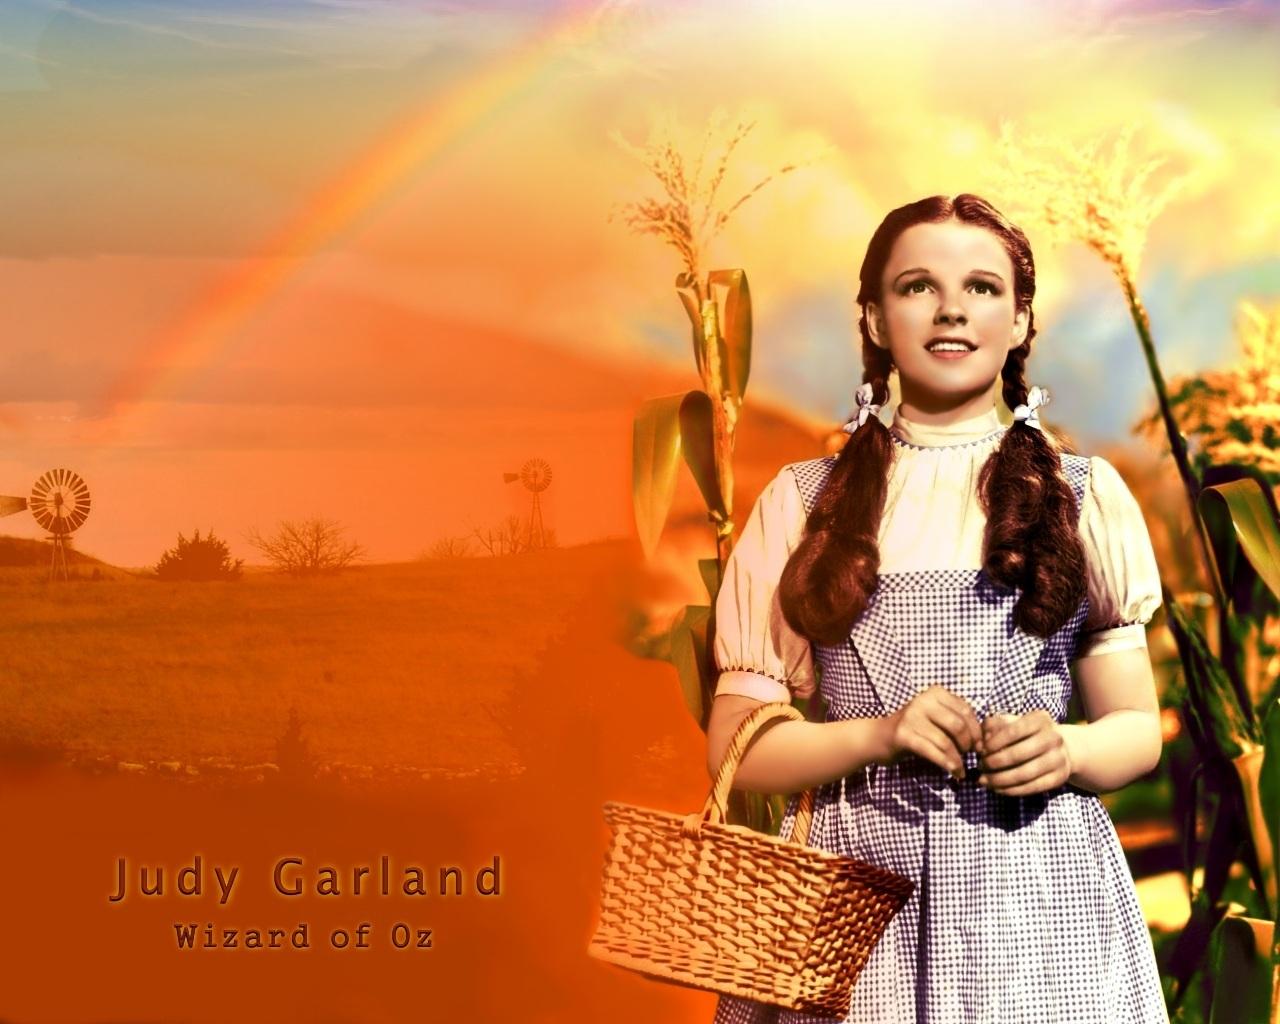 Download Judy Garland Wizard Of Oz Wallpaper CloudPix [1280x1024 1280x1024